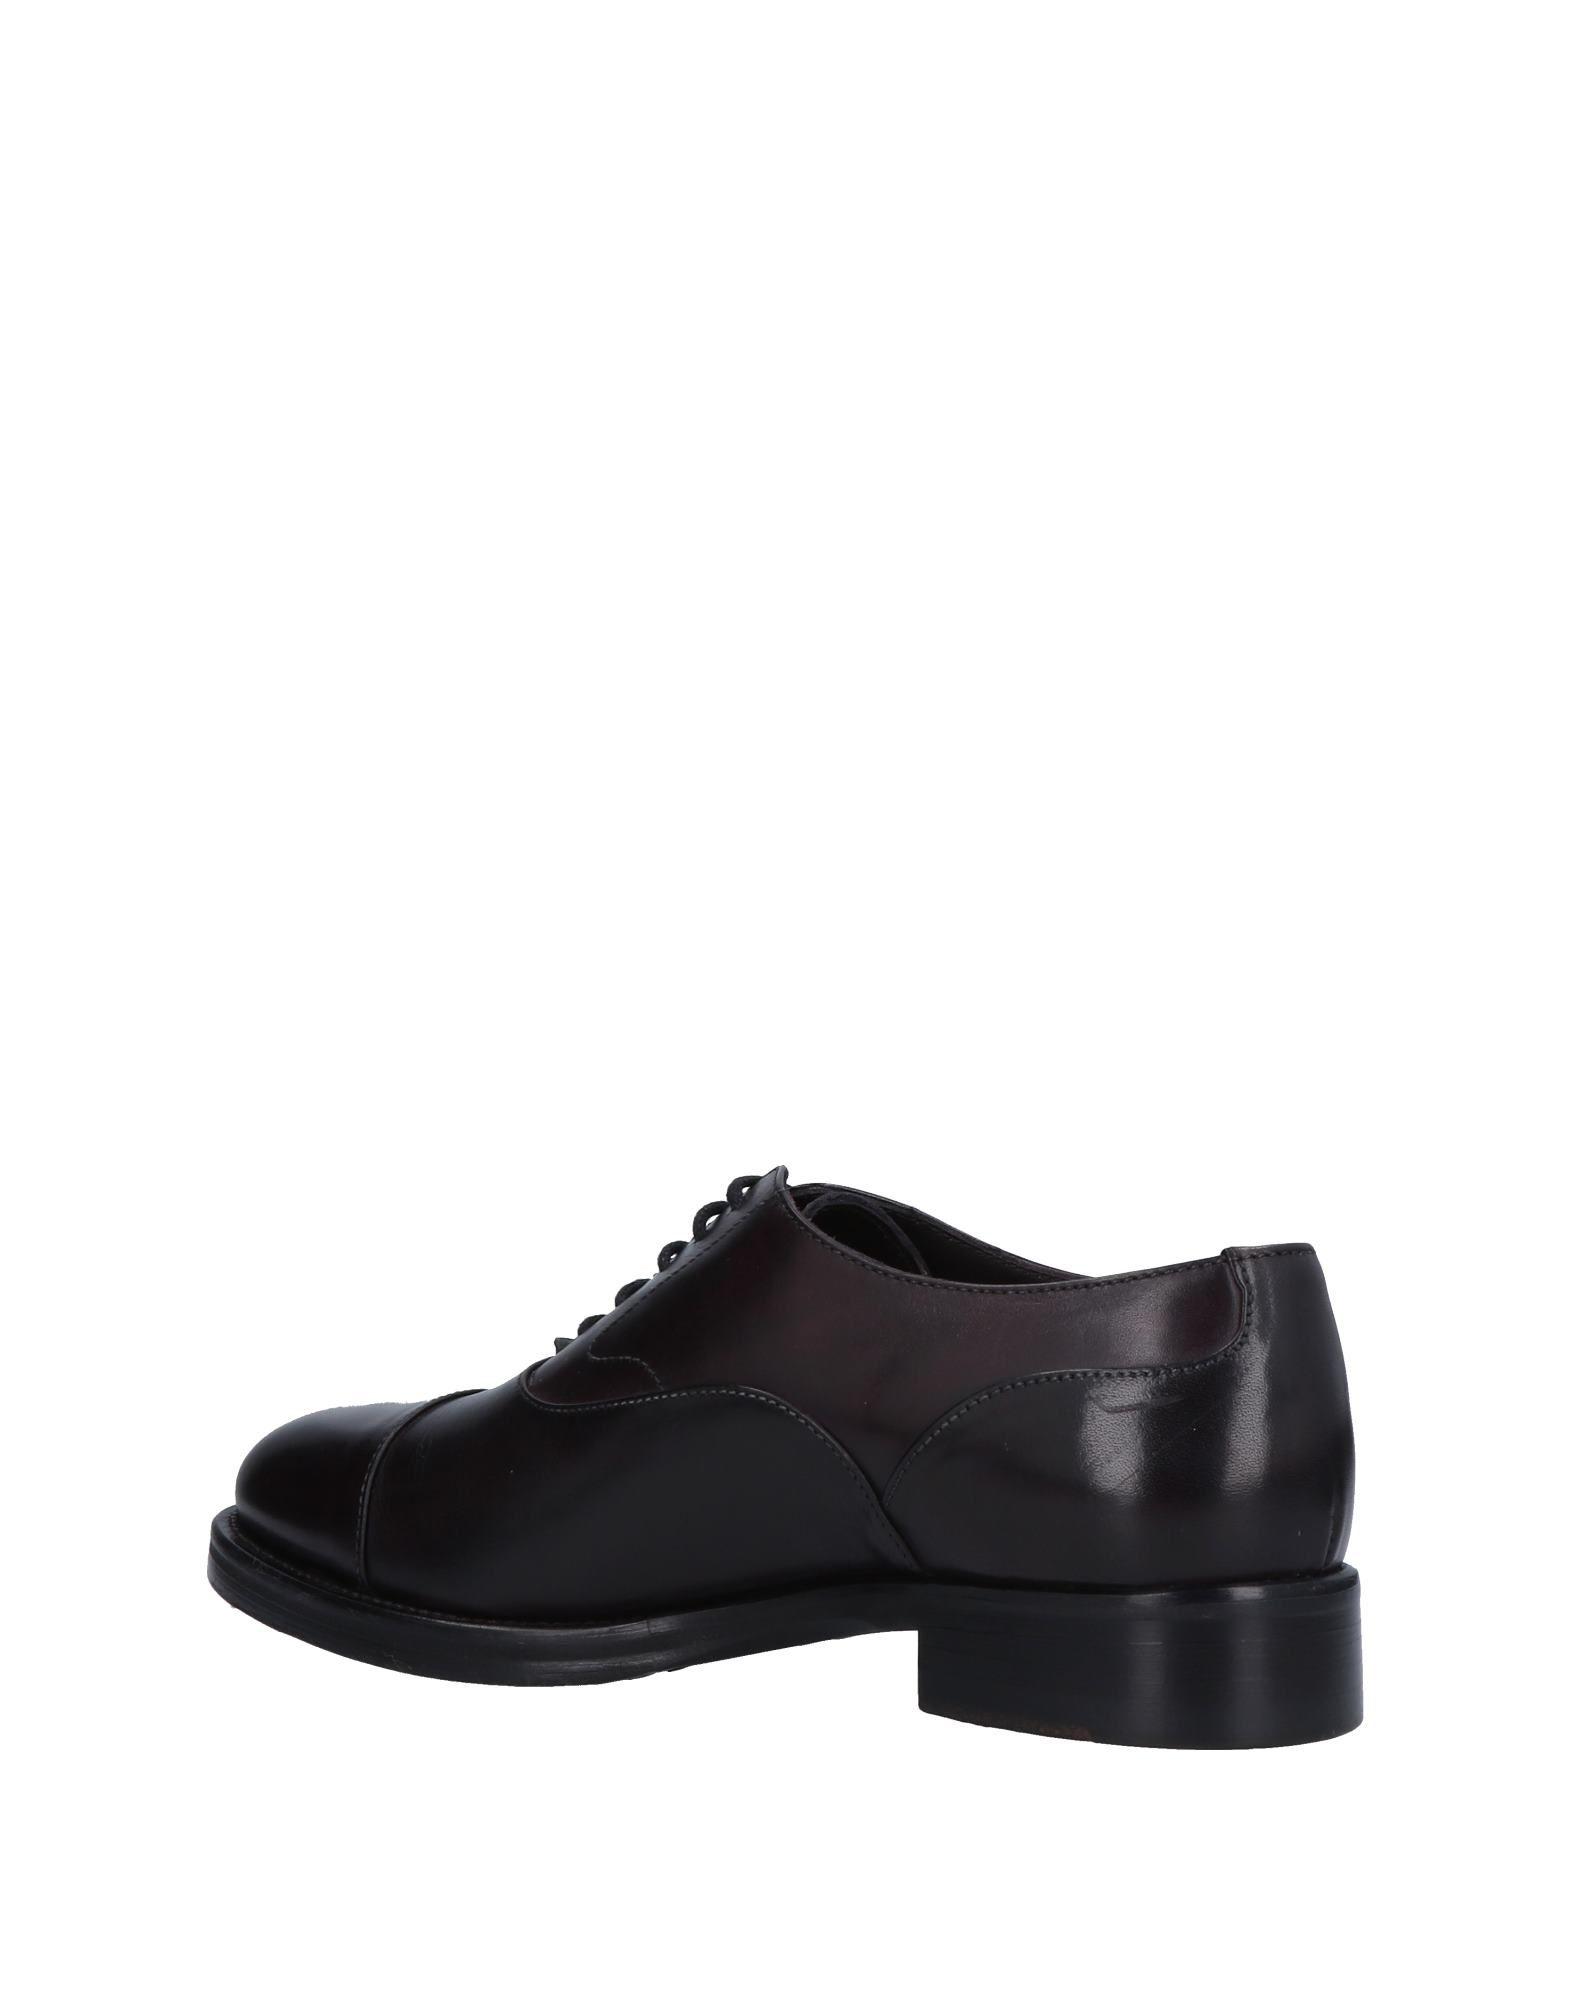 Jerold Wilton Gute Schnürschuhe Damen  11502890KK Gute Wilton Qualität beliebte Schuhe c7f96b